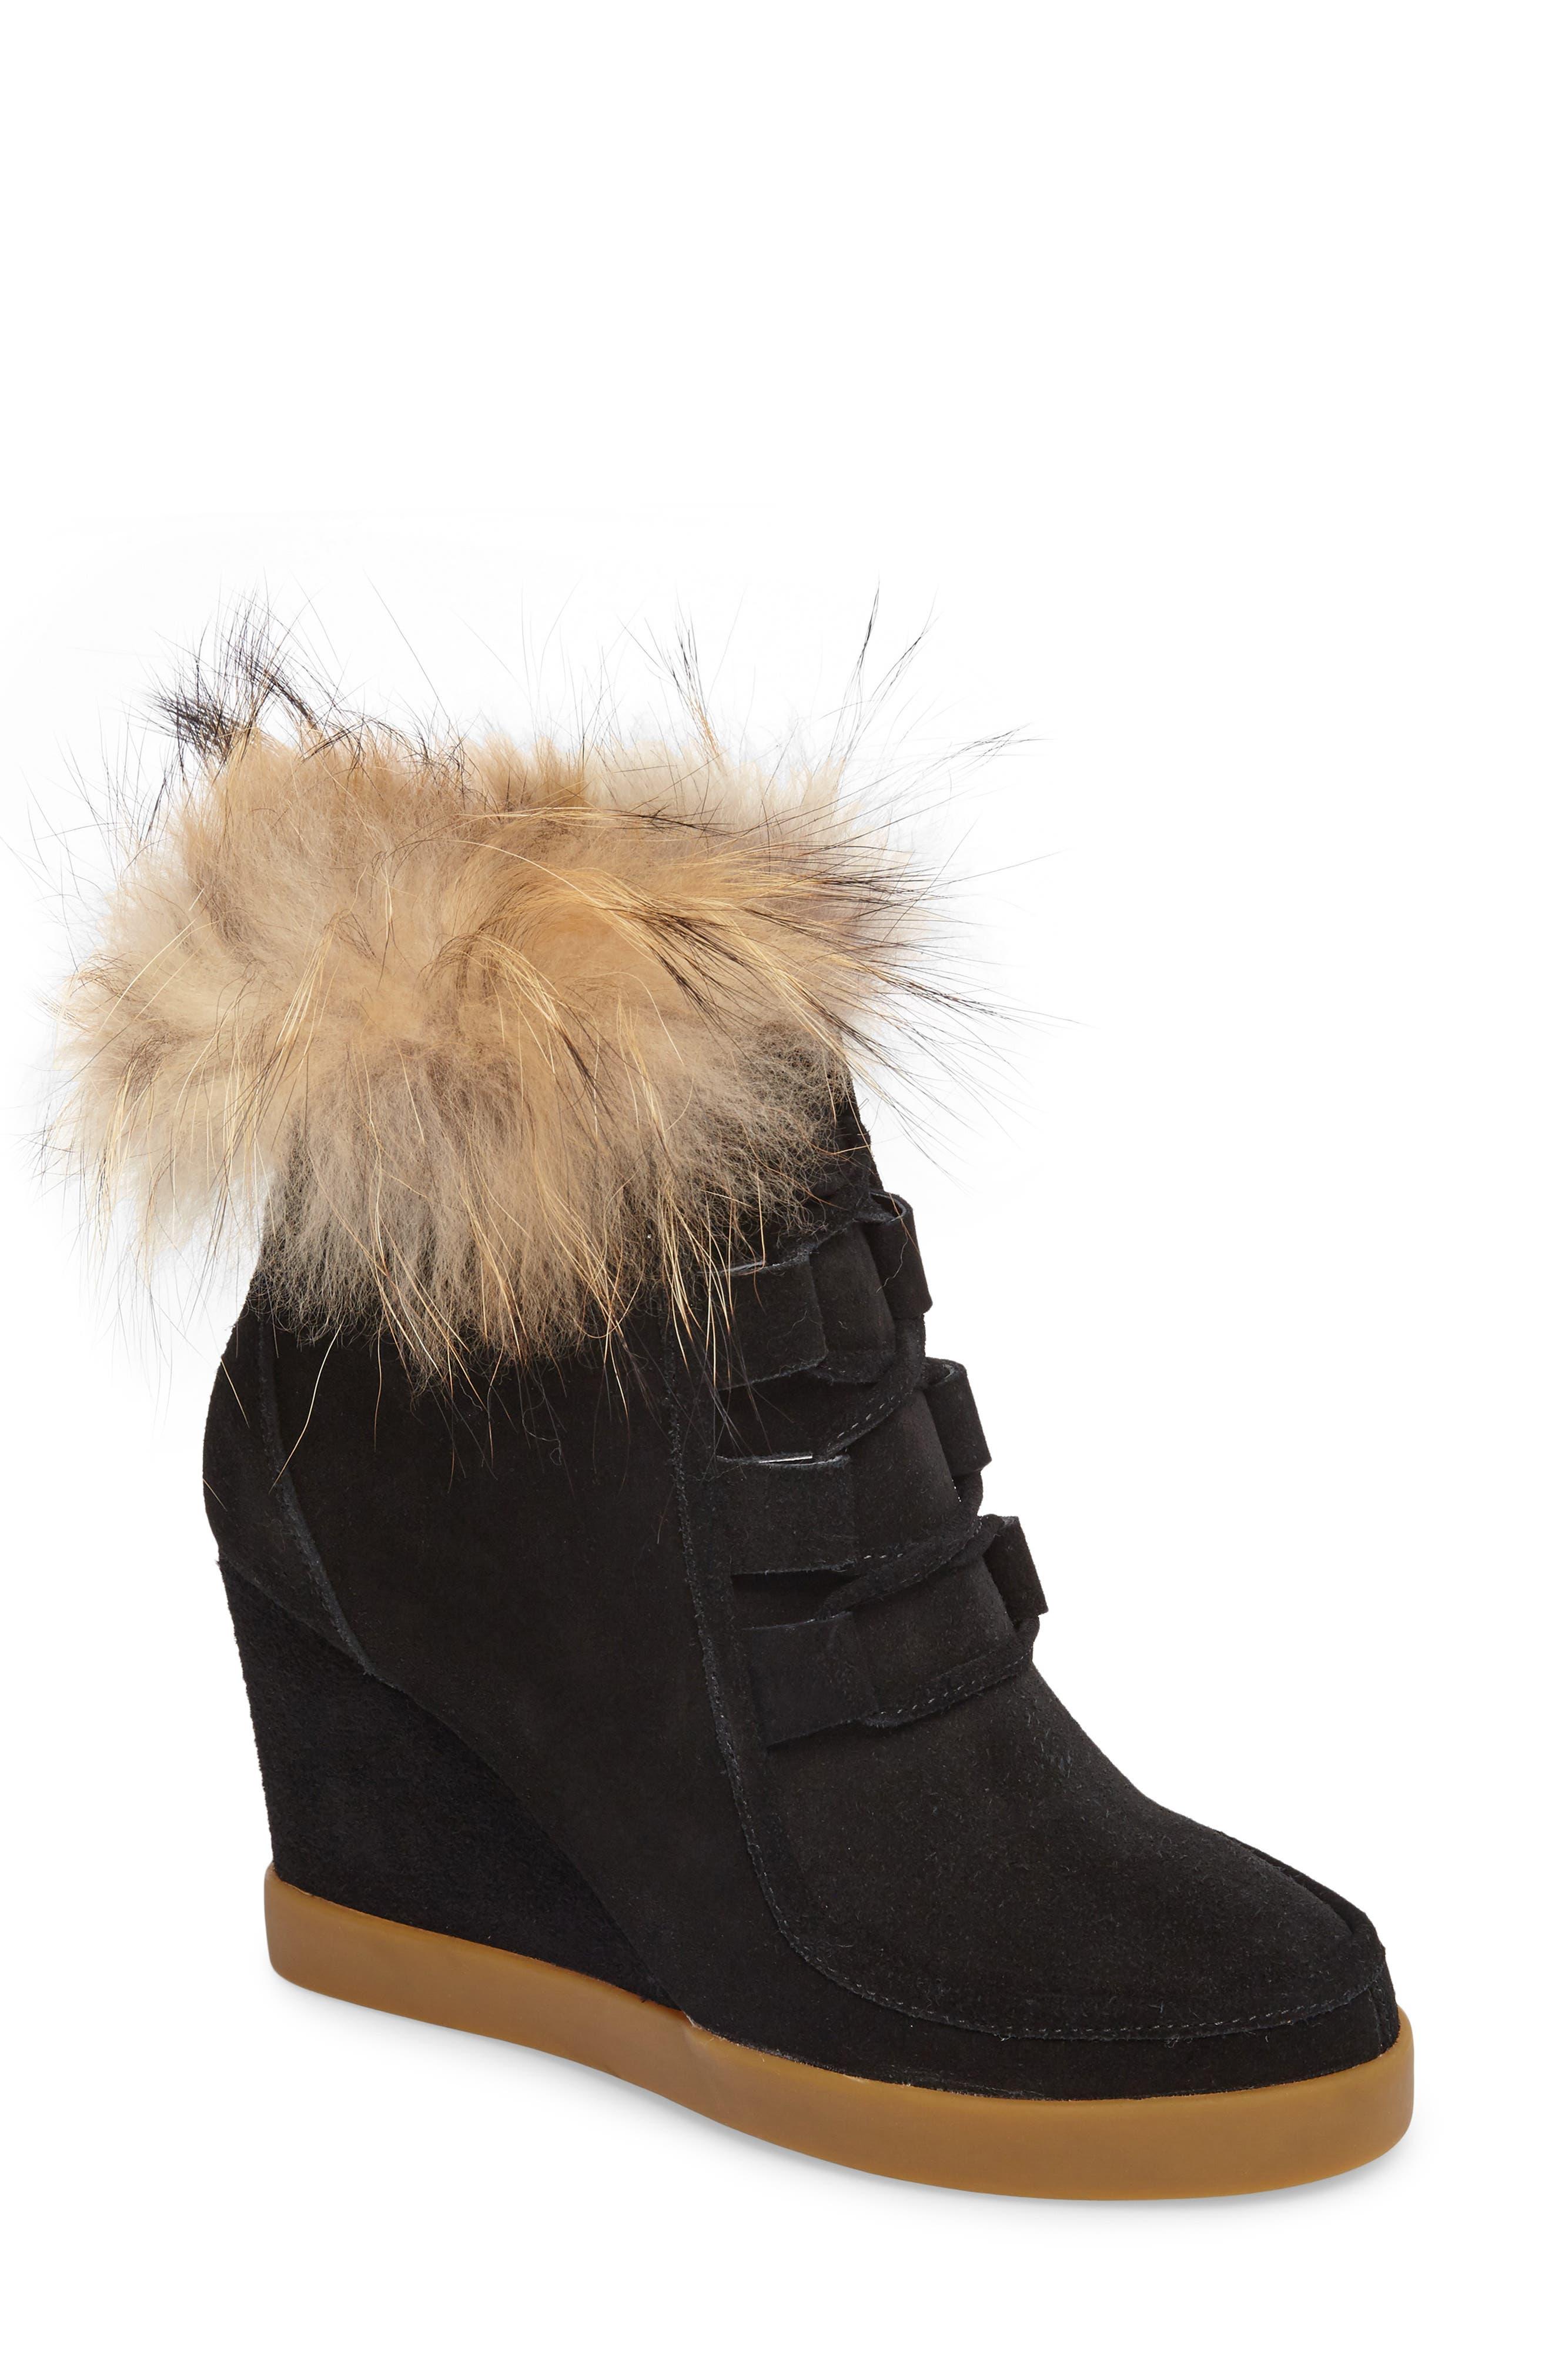 Alternate Image 1 Selected - Cecelia New York Holly Wedge Bootie with Genuine Fox Fur Trim (Women)